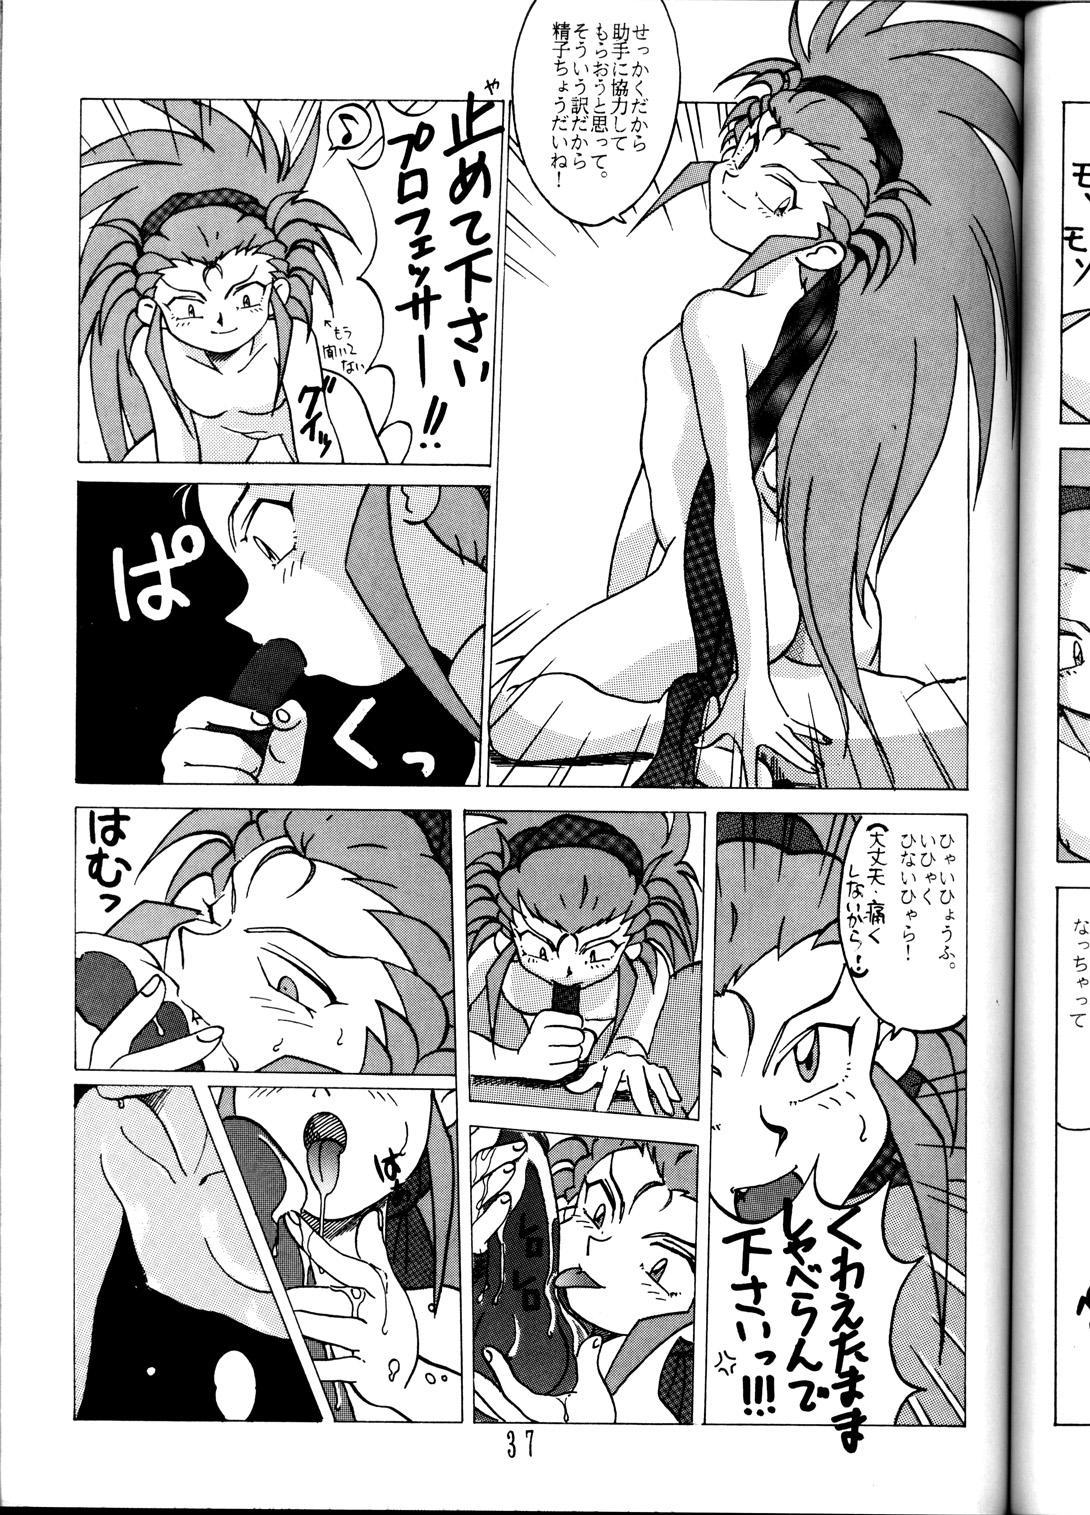 Tenchi Muyou! Sample Vol 6 35